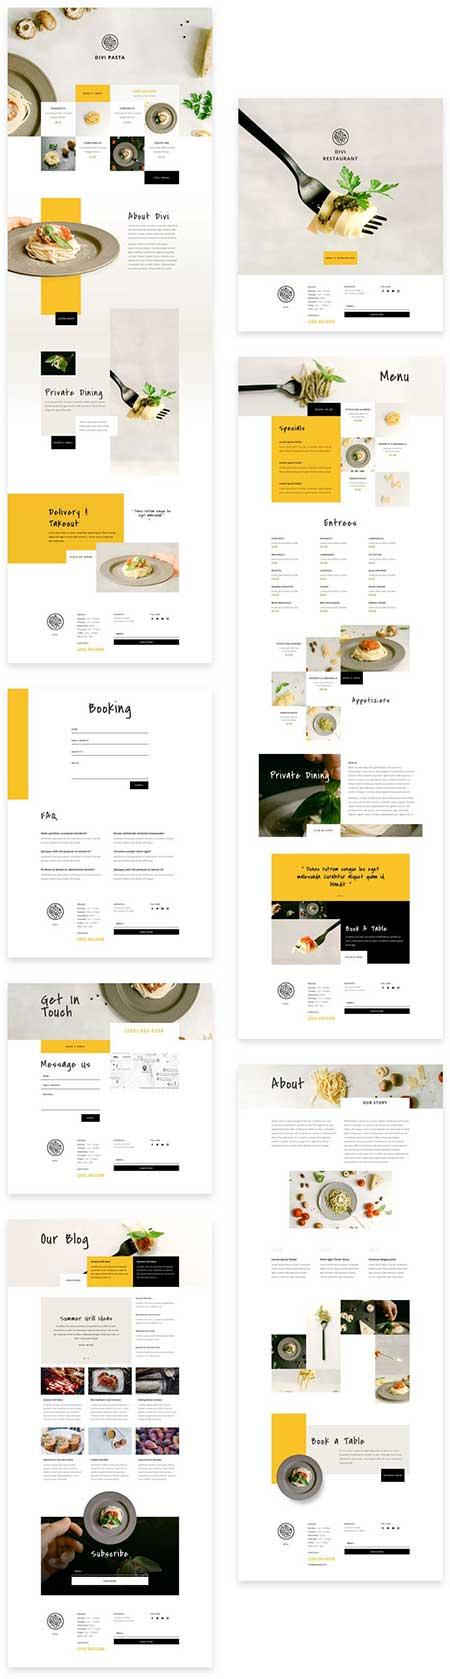 Divi Italian restaurant layout pack